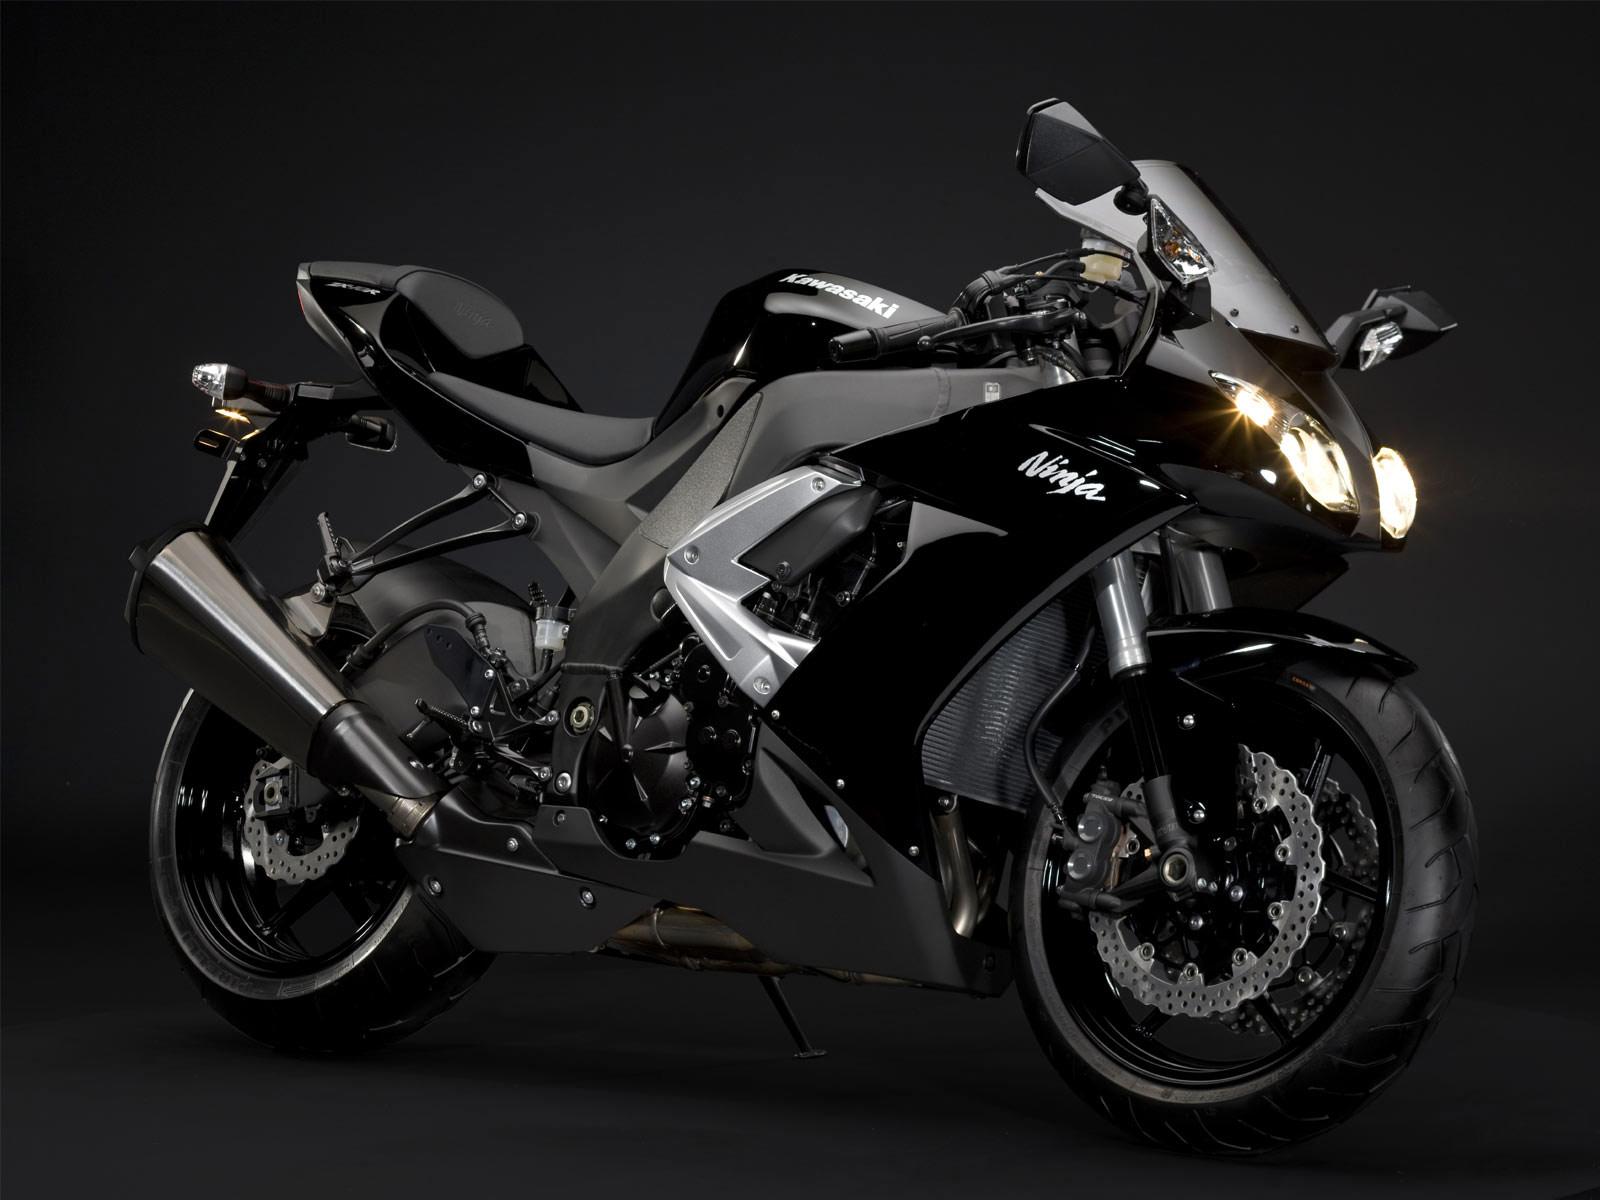 Image of Gambar Motor Kawasaki Ninja R